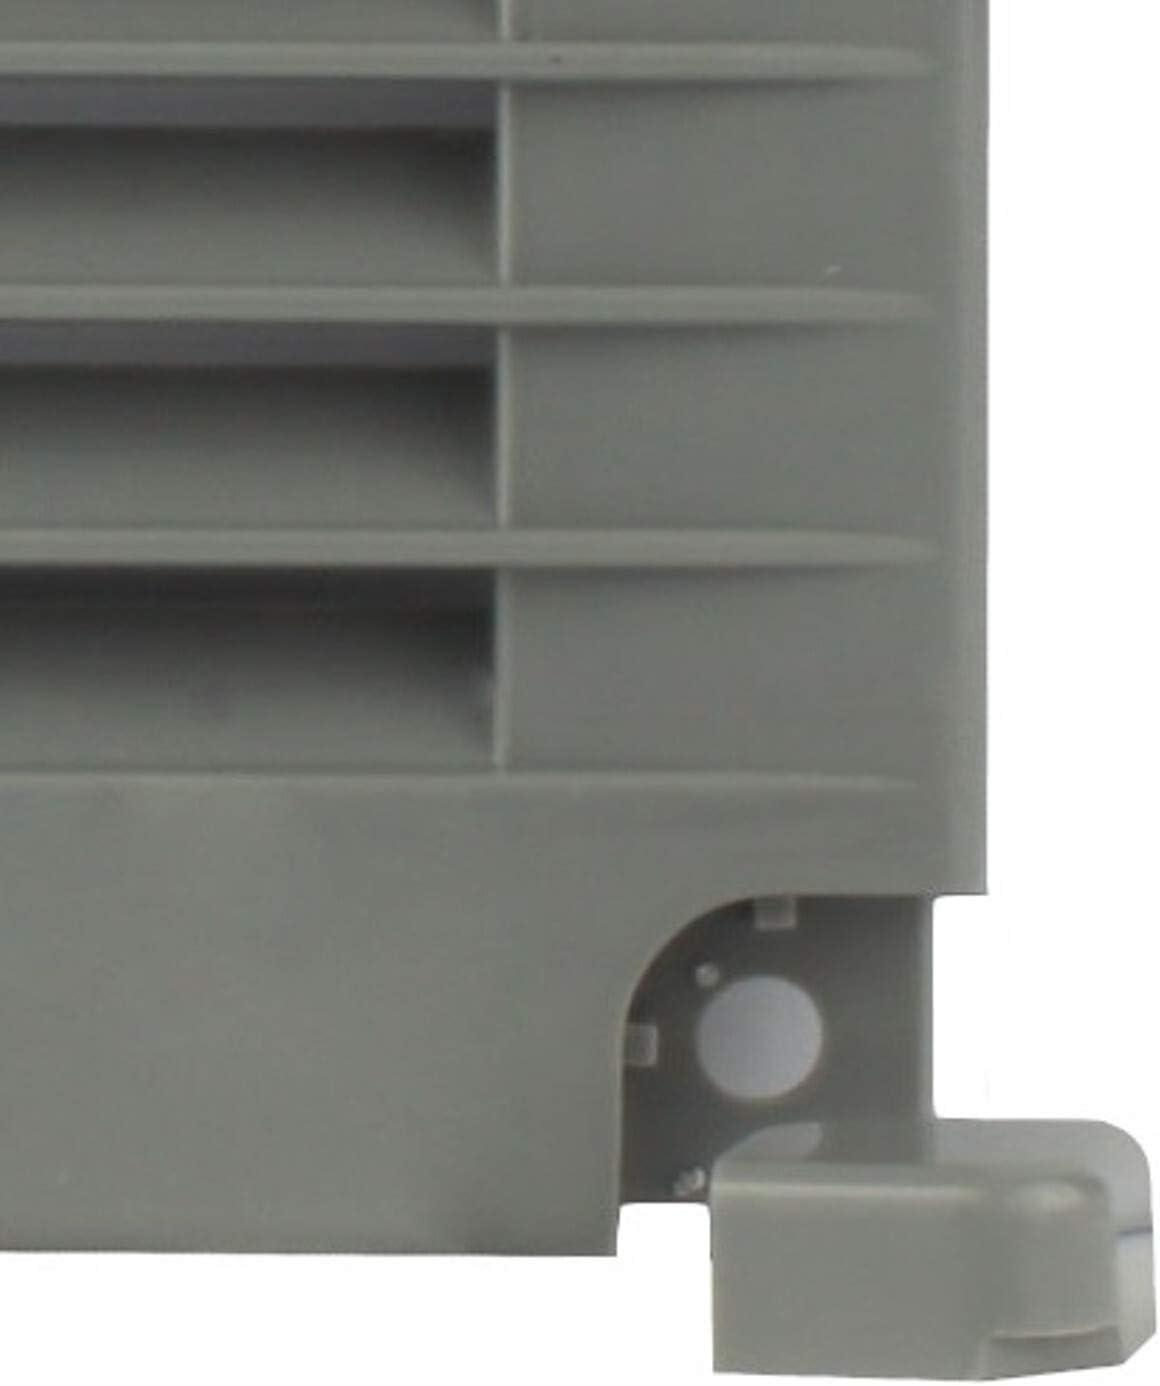 MKK L/üftungsgitter Abluftgitter Lamellengitter Insektenschutz Kunststoff eckig 250 x 250 mm braun Nein